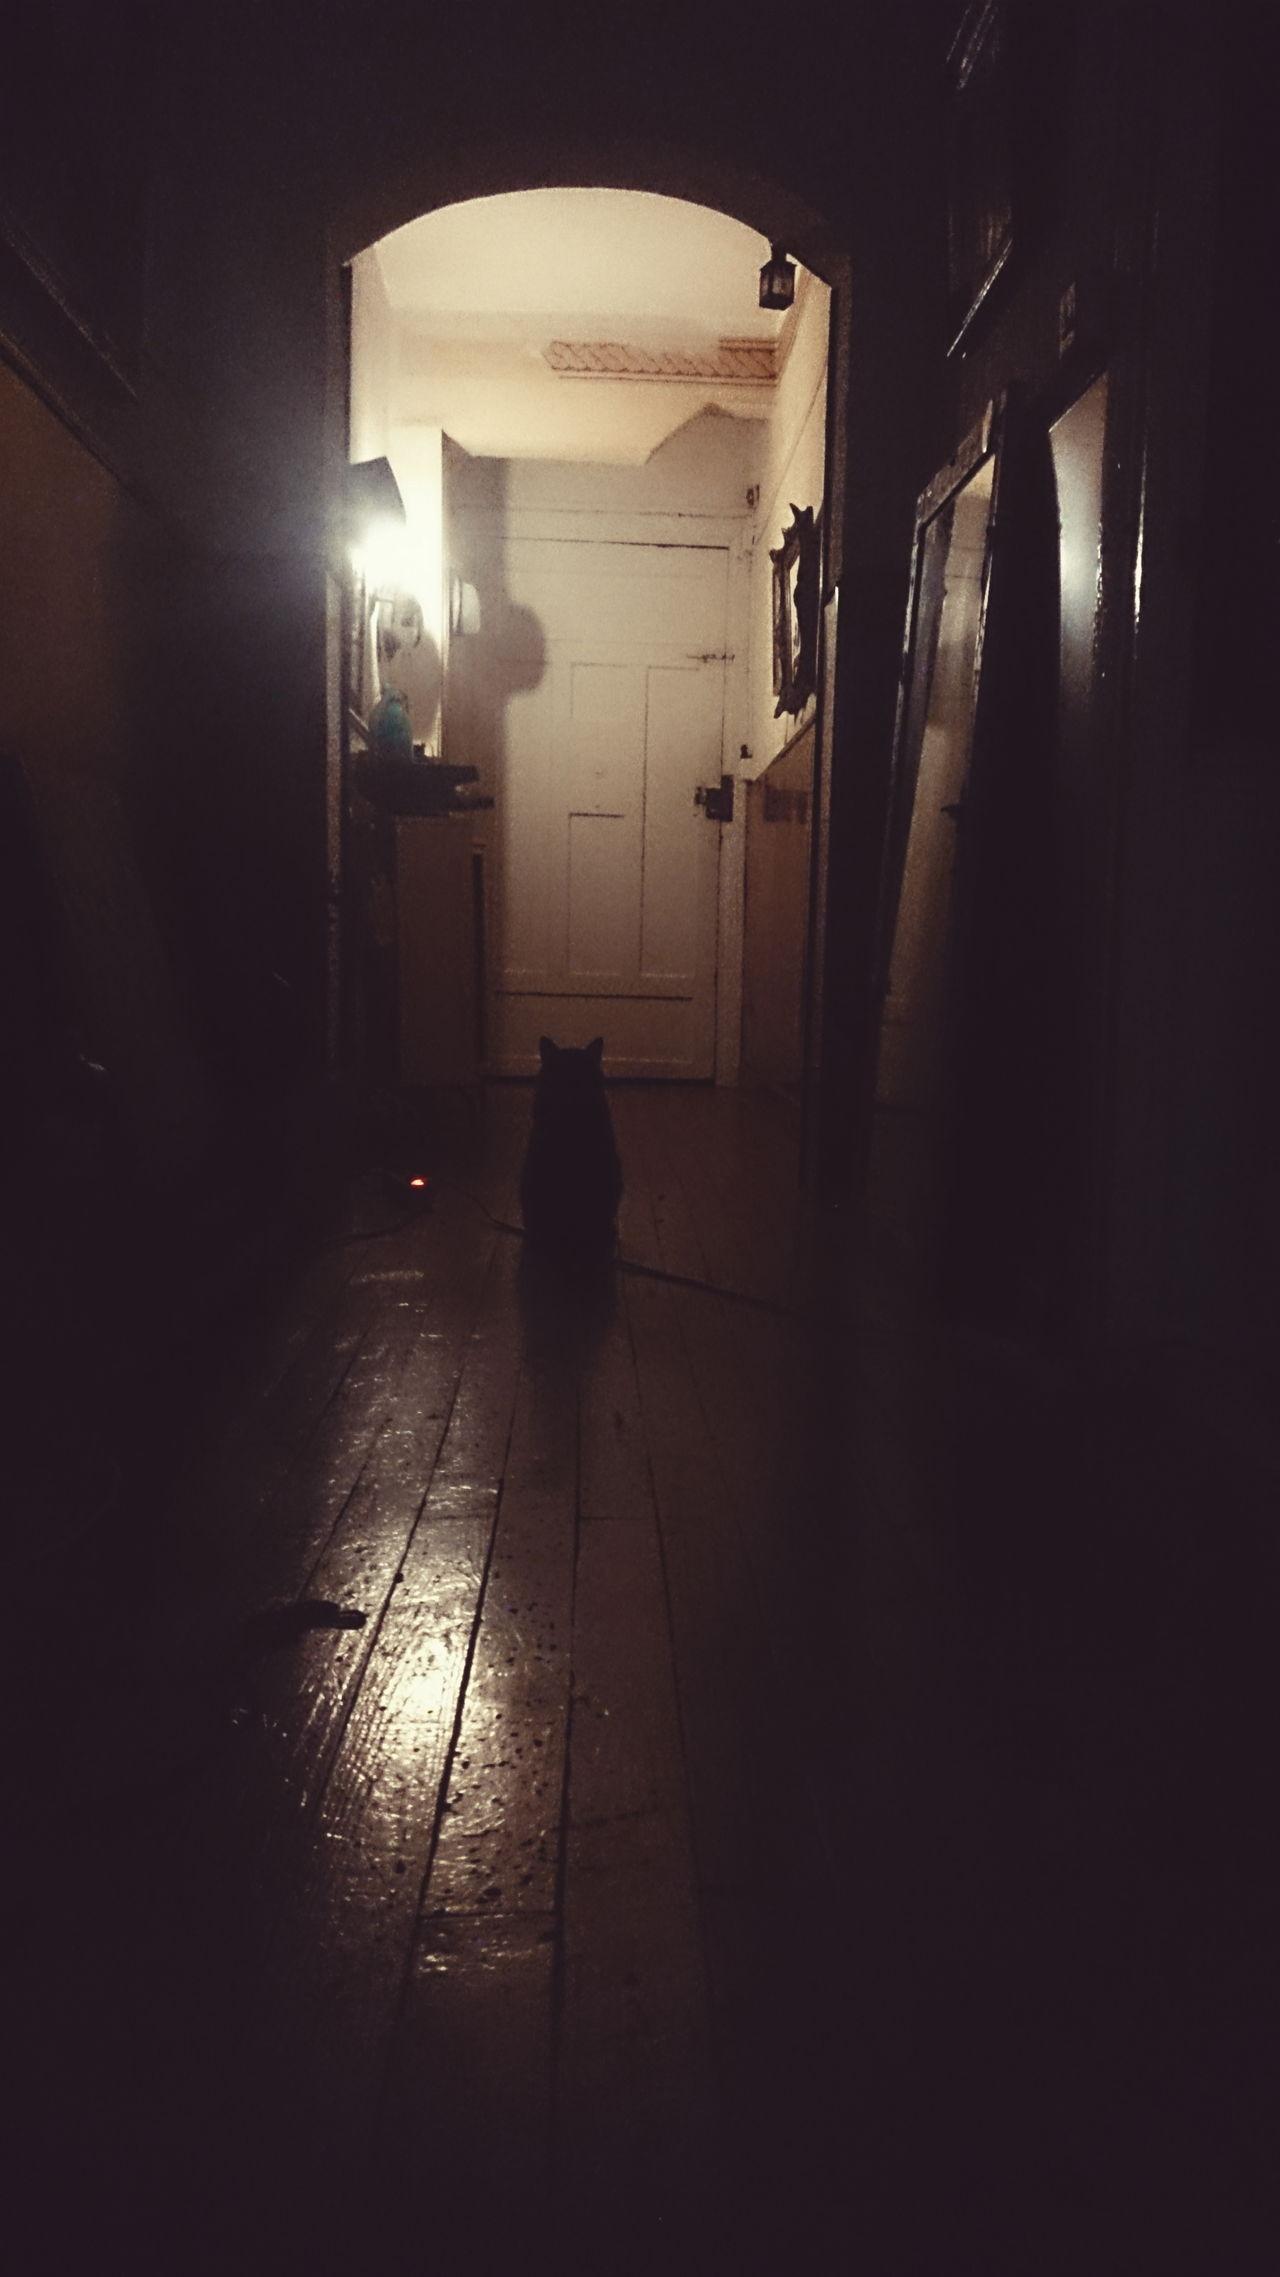 Black cat Architecture Building Cat City Life Corridor Corridors  Dark Dark Day Full Length Illuminated Leisure Activity Lifestyles The Way Forward Tunnel Unrecognizable Person